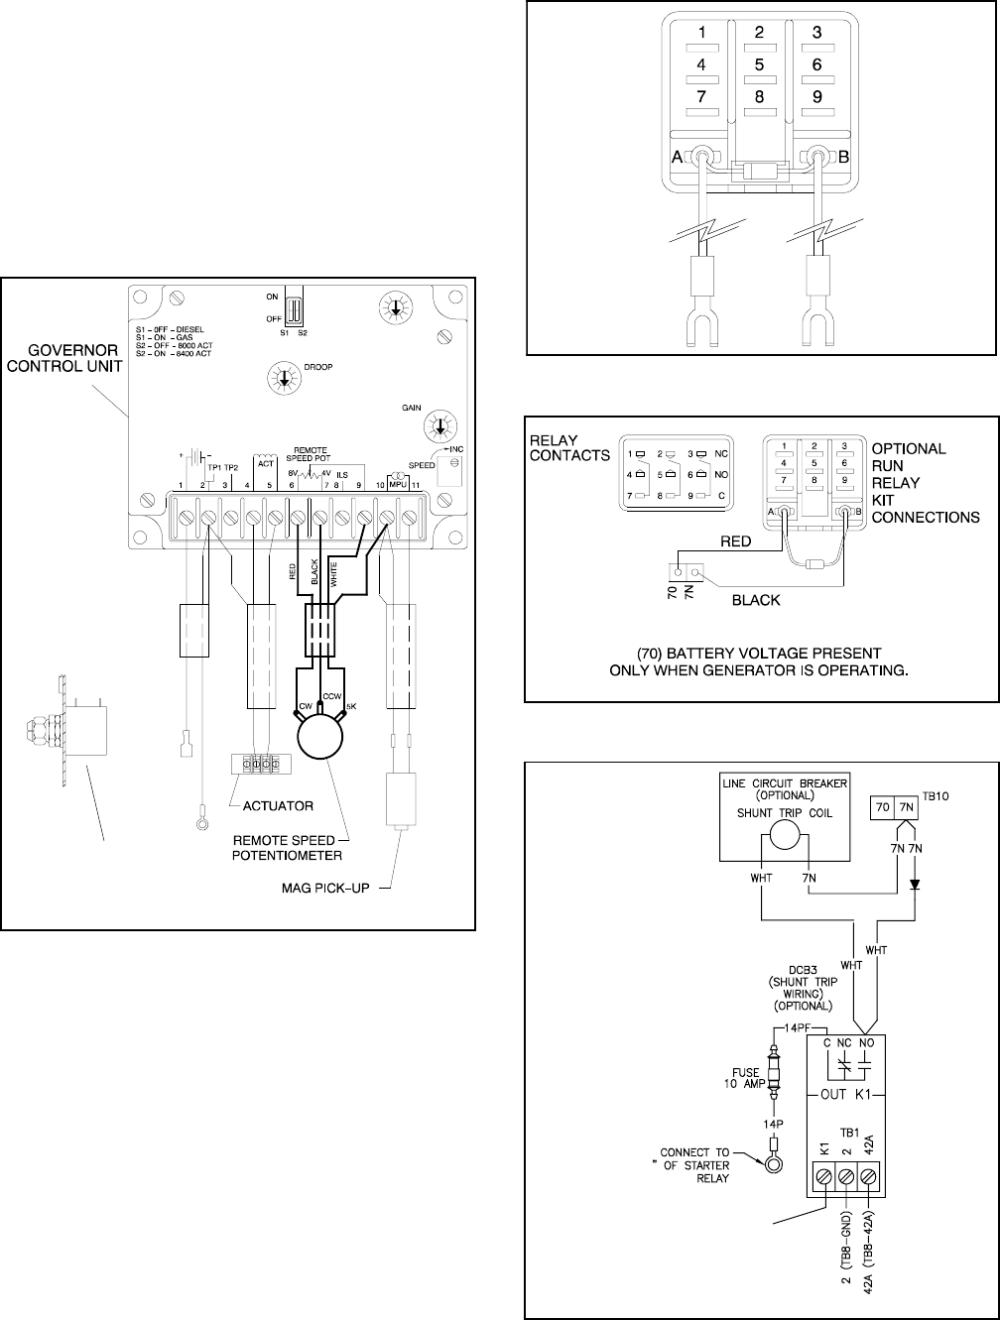 medium resolution of kohler 20 3250 kw 6 1 12 remote speed adjustment potentiometer kit non ecm models 6 1 13 run relay kit 6 1 14 shunt trip line circuit breaker